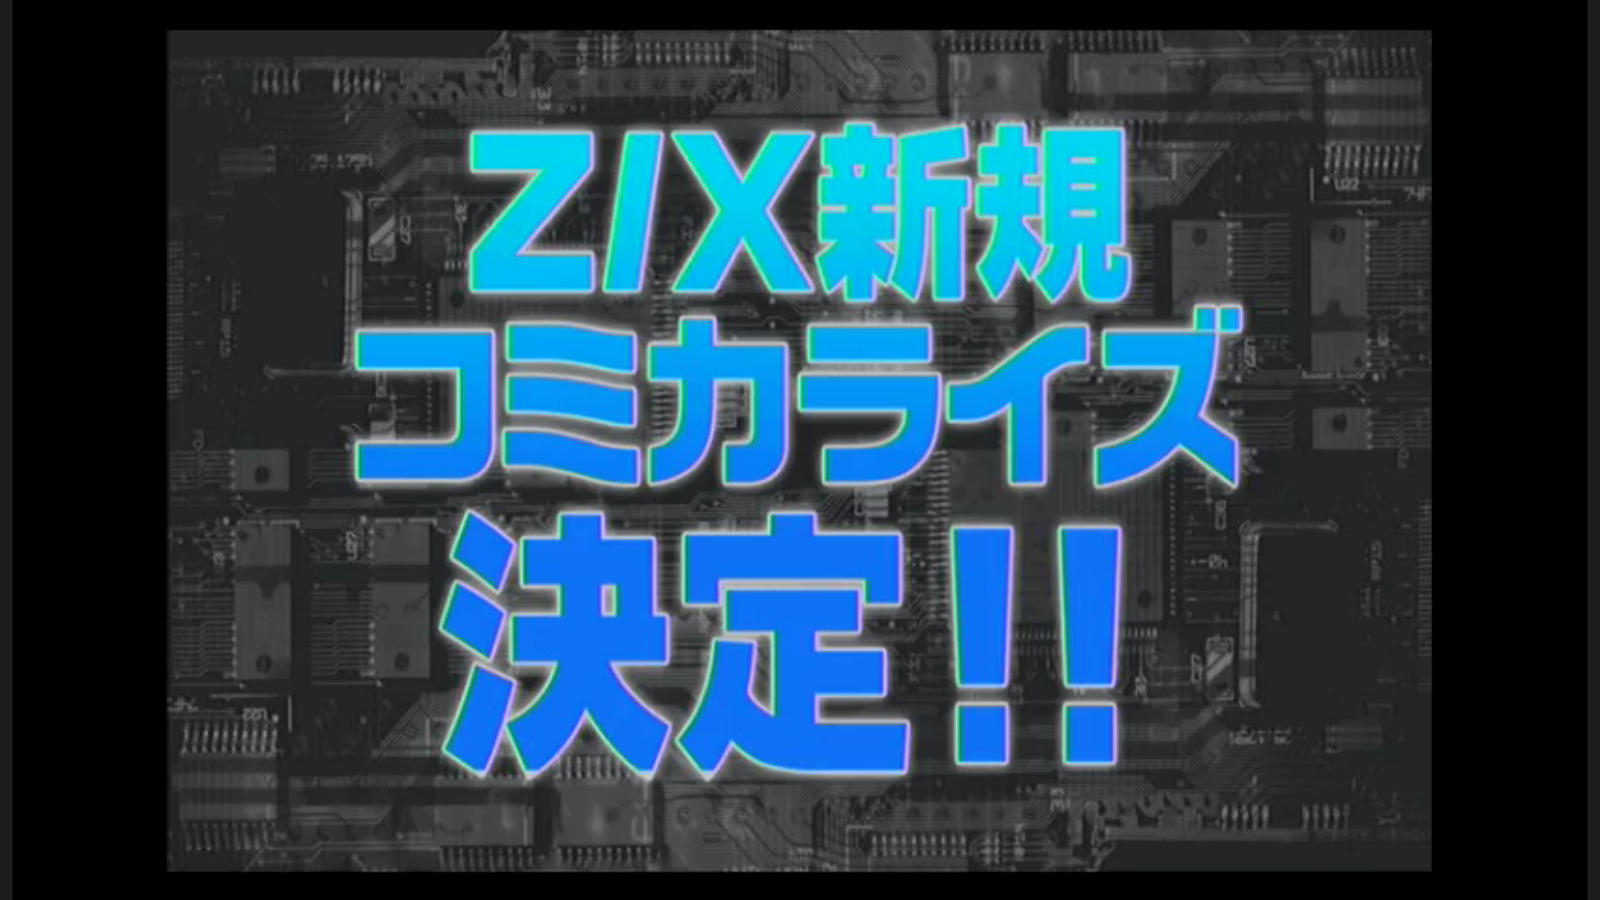 zx-zxtreme-2017spring-20170312-040.jpg